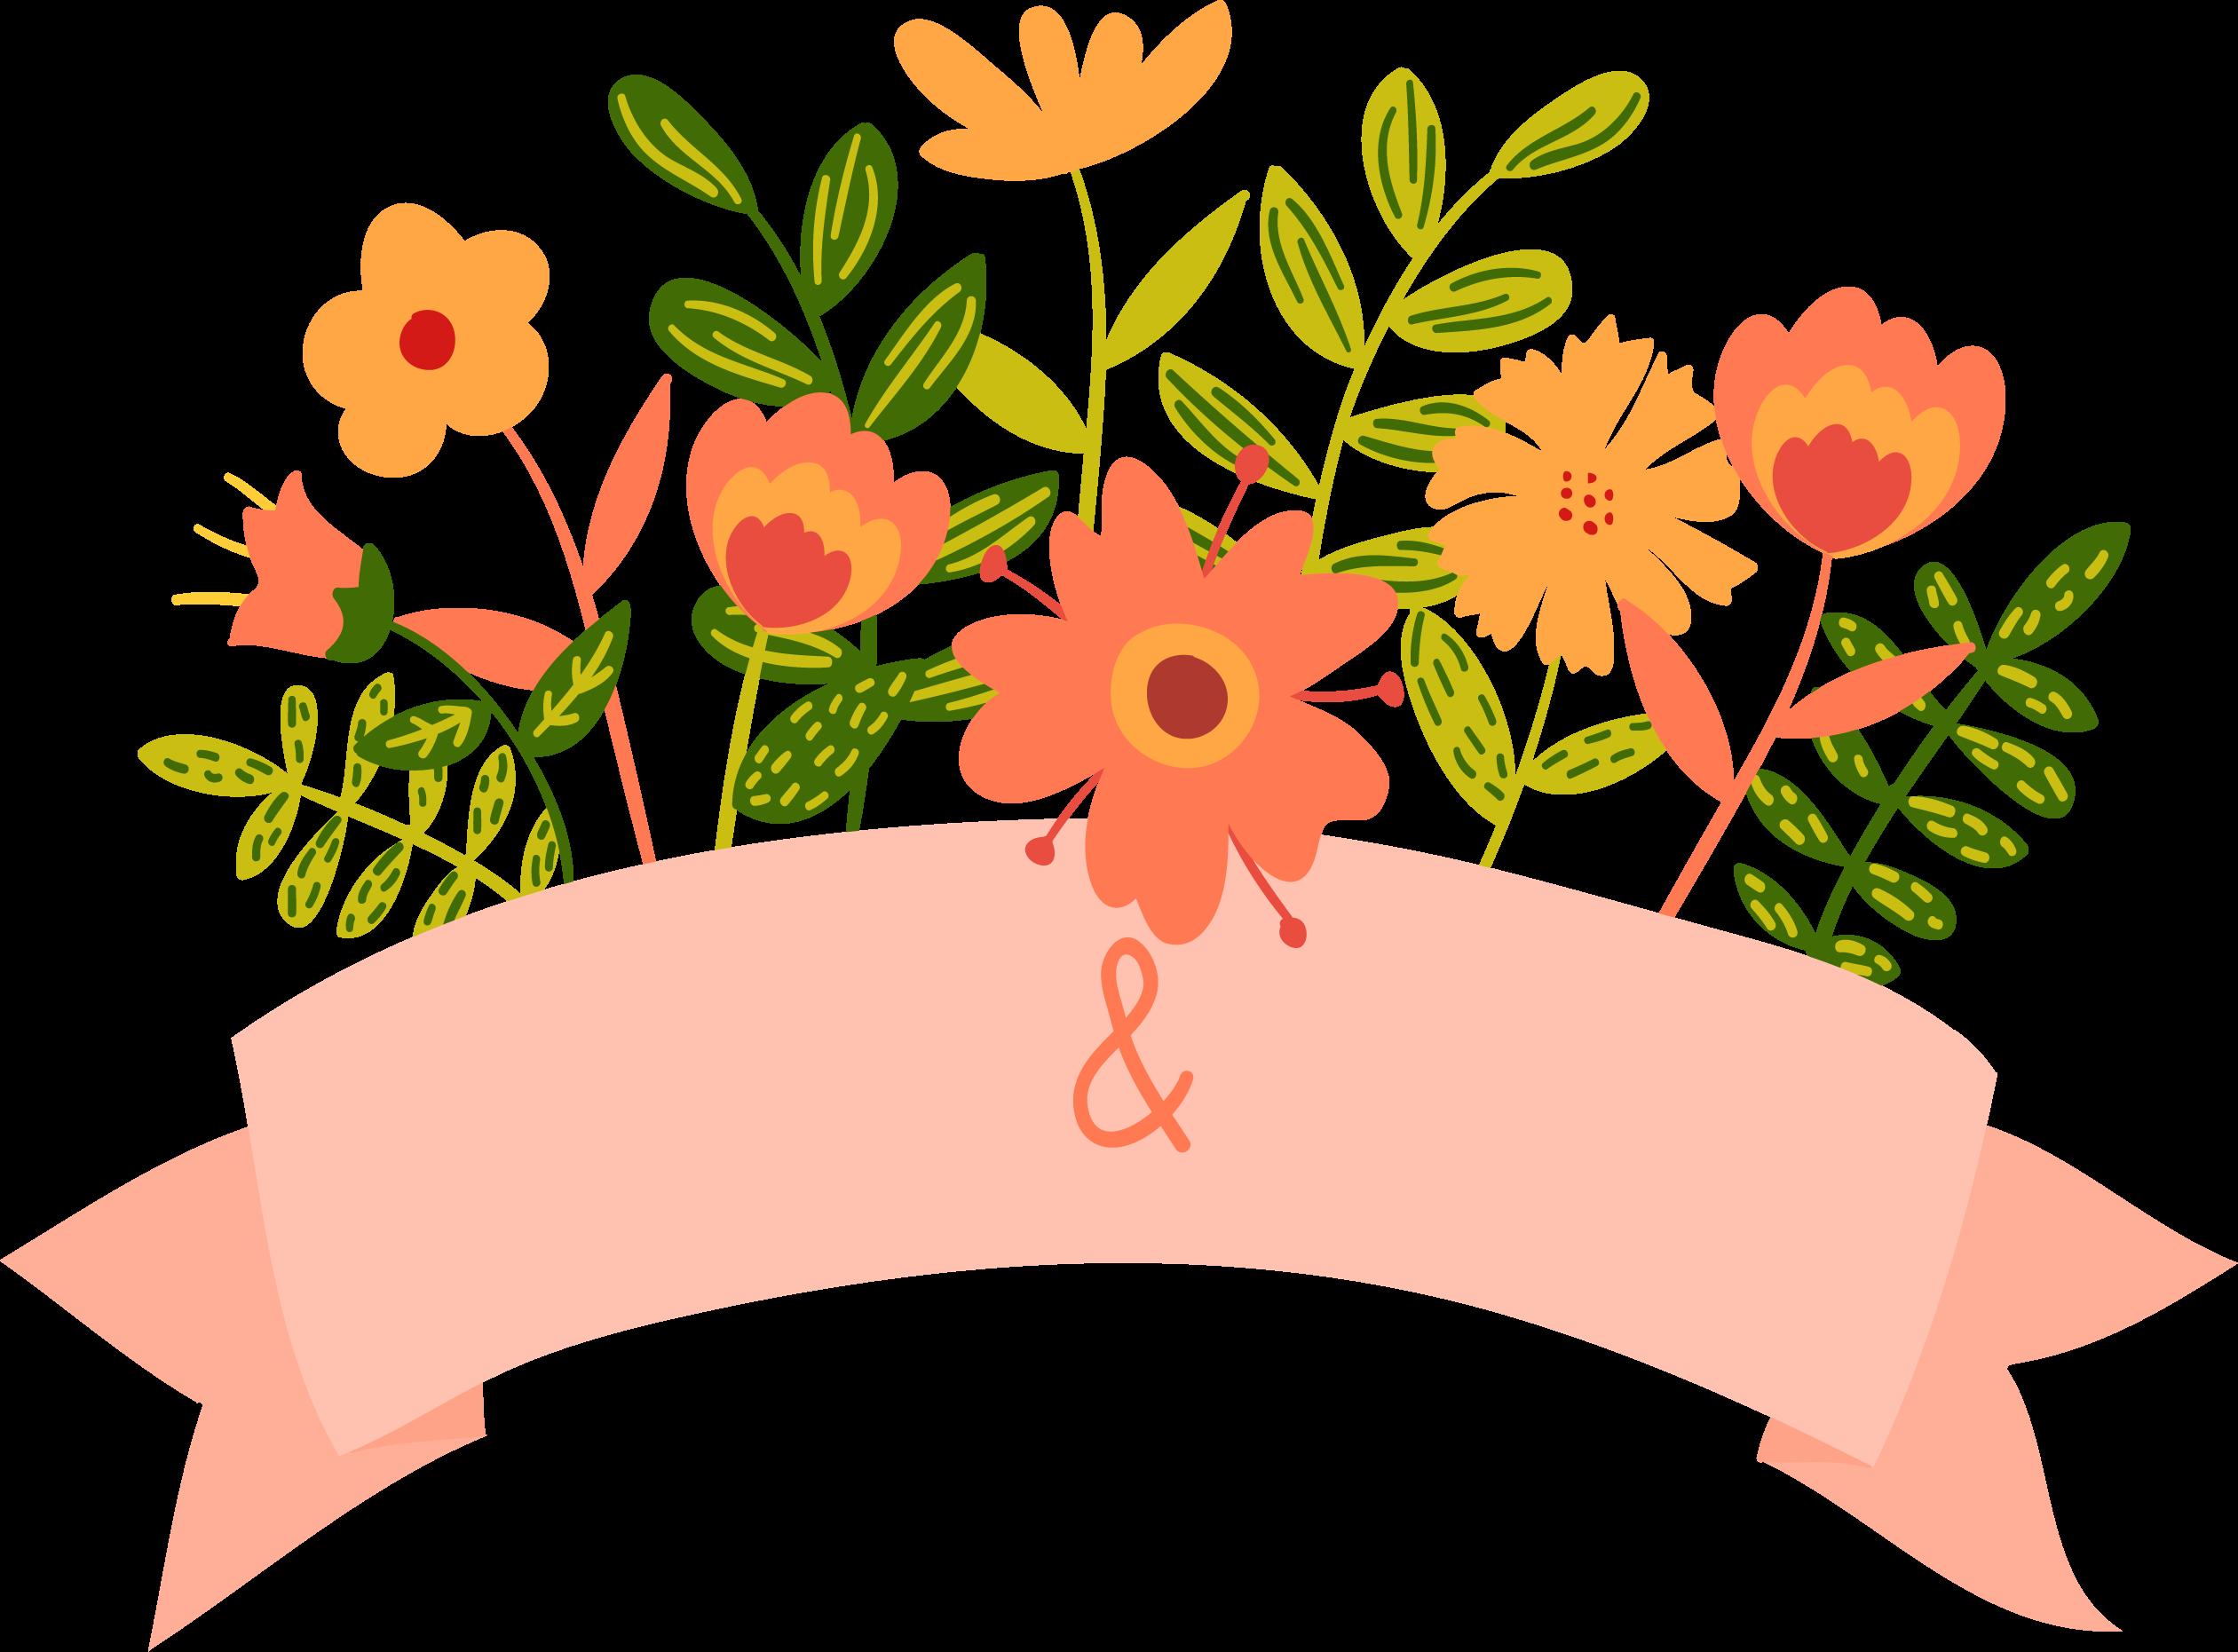 Flower banner png. Cartoon floral wedding invitation